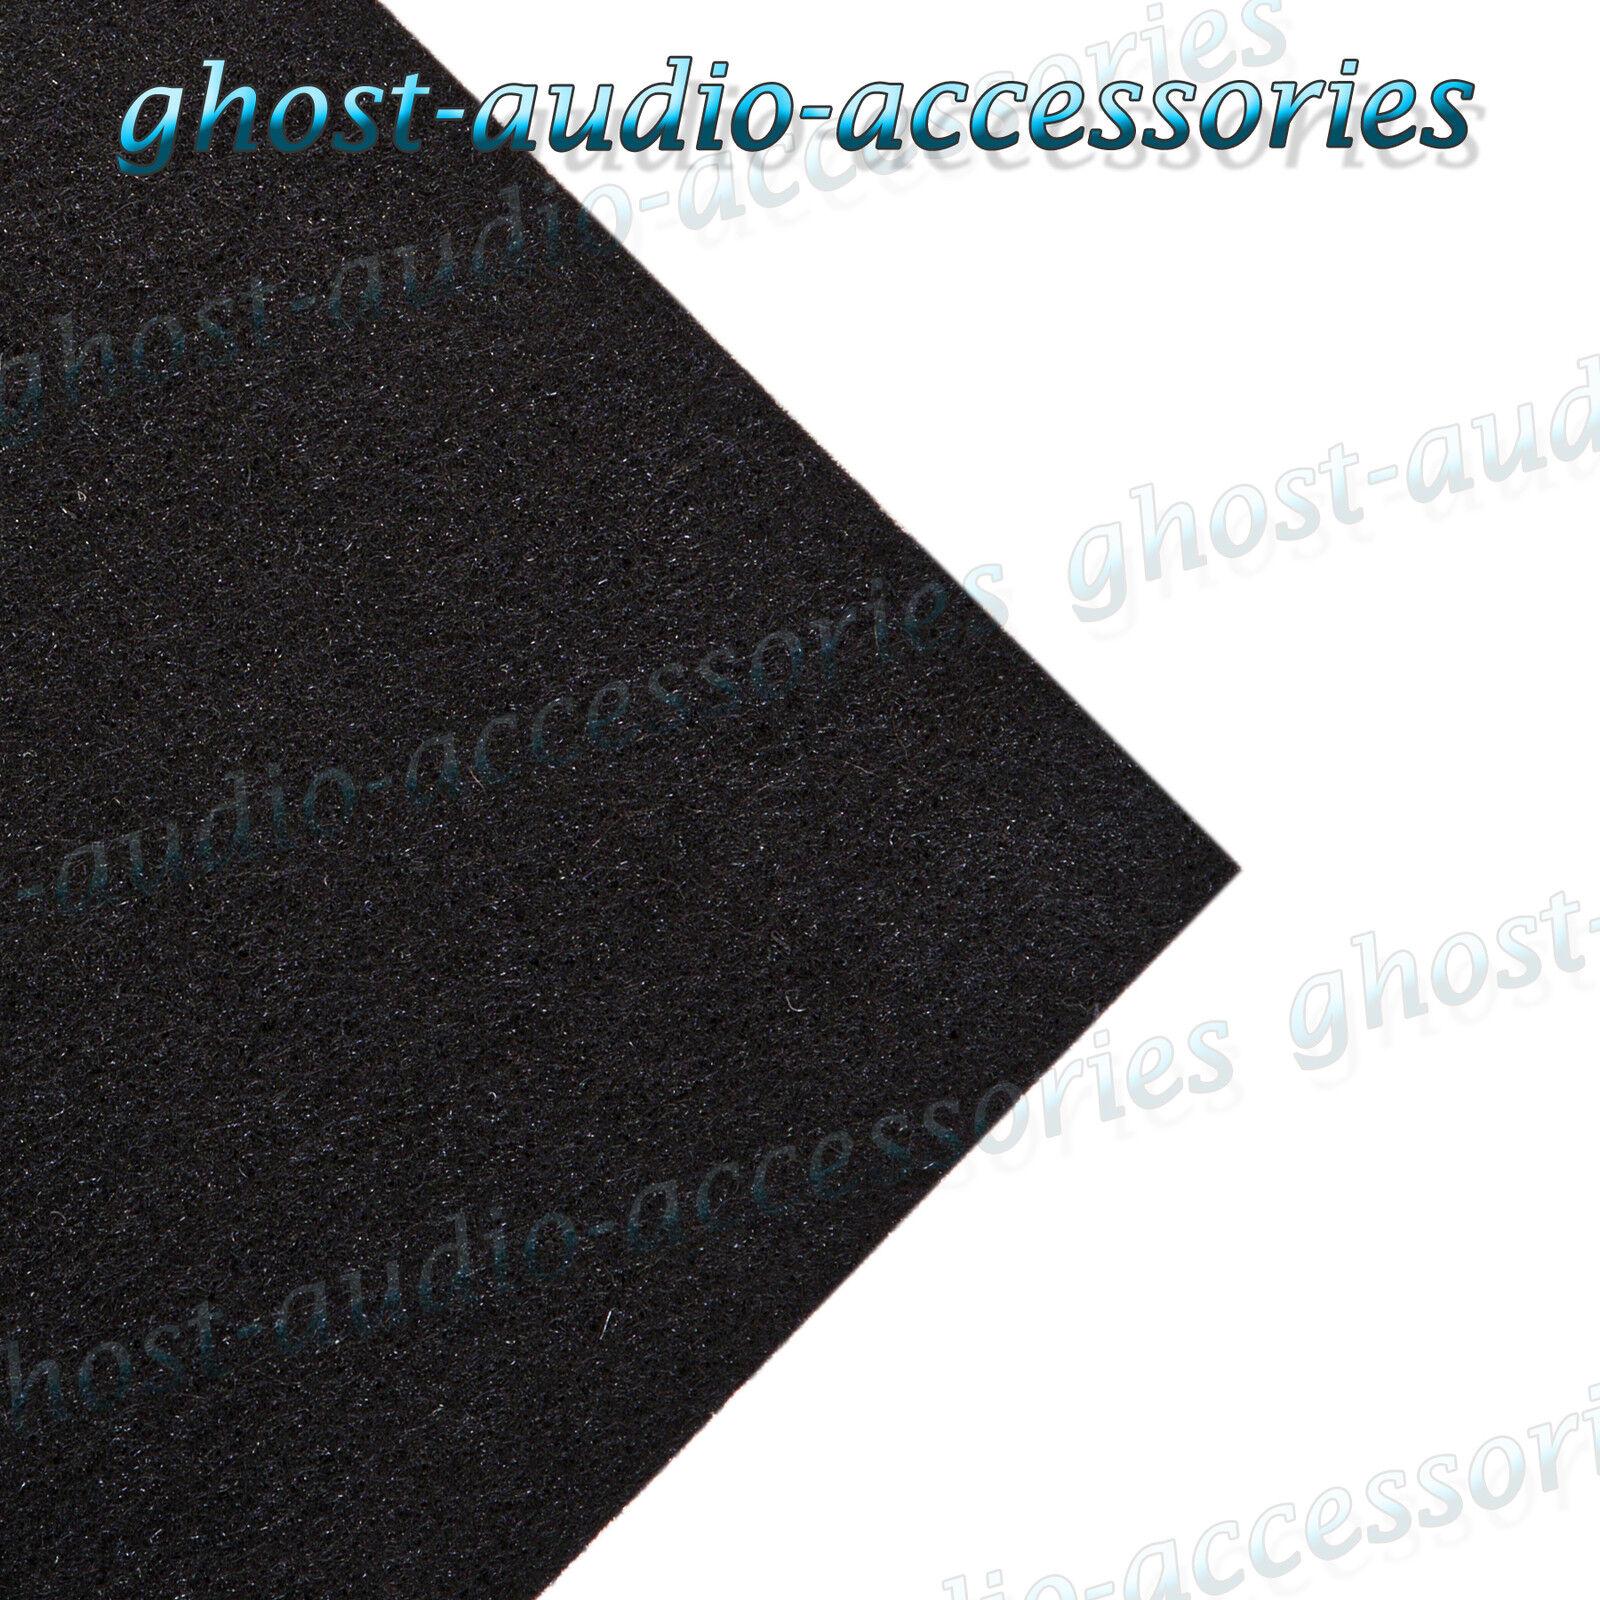 boot//van lining 9m x 1.5m Light Grey Acoustic Cloth Carpet for parcel shelf